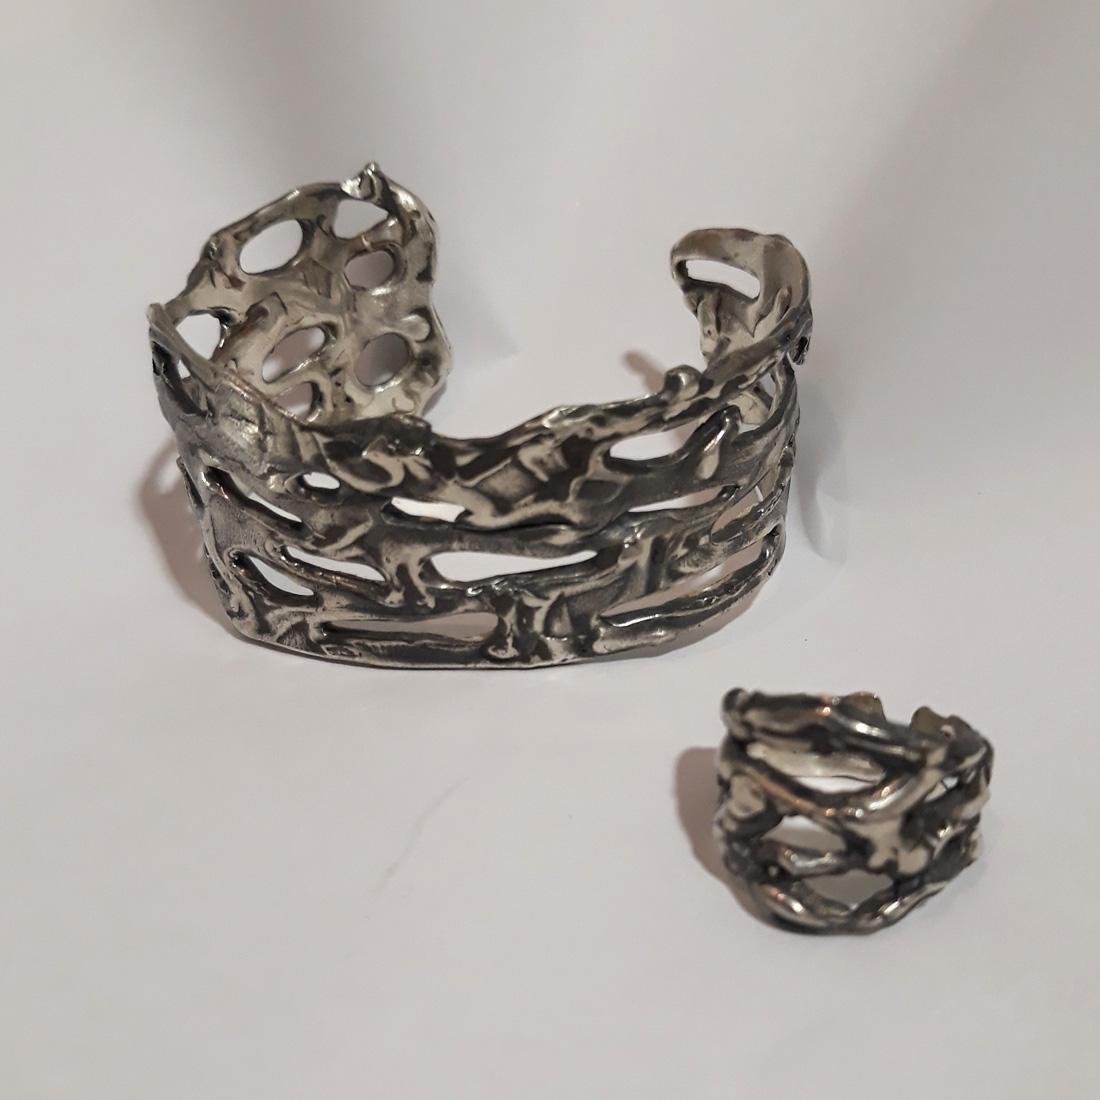 brazalete de plata para mujer, joyas artesanales, joyas para regalar, pepamassana, joyasmarket